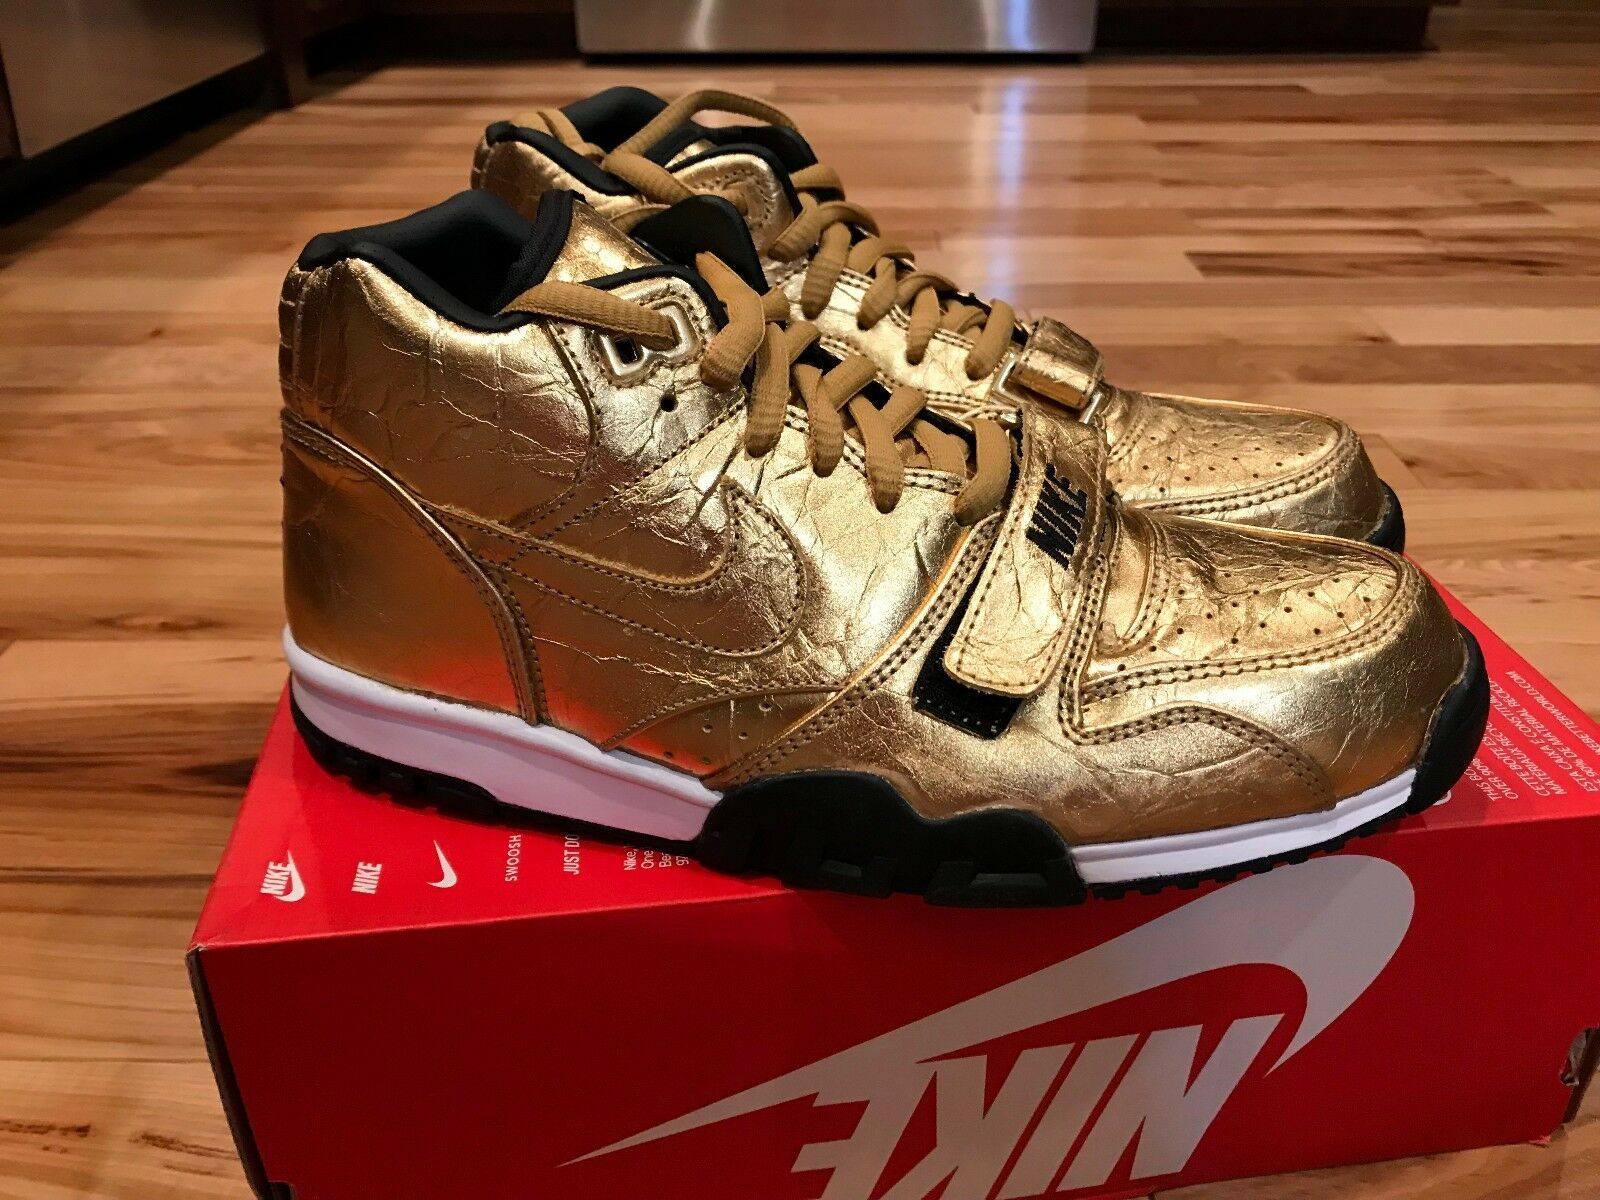 Nike air - 1 sonodiventate qs (nfl) super bowl 50 d'oro 840169-700 uomo